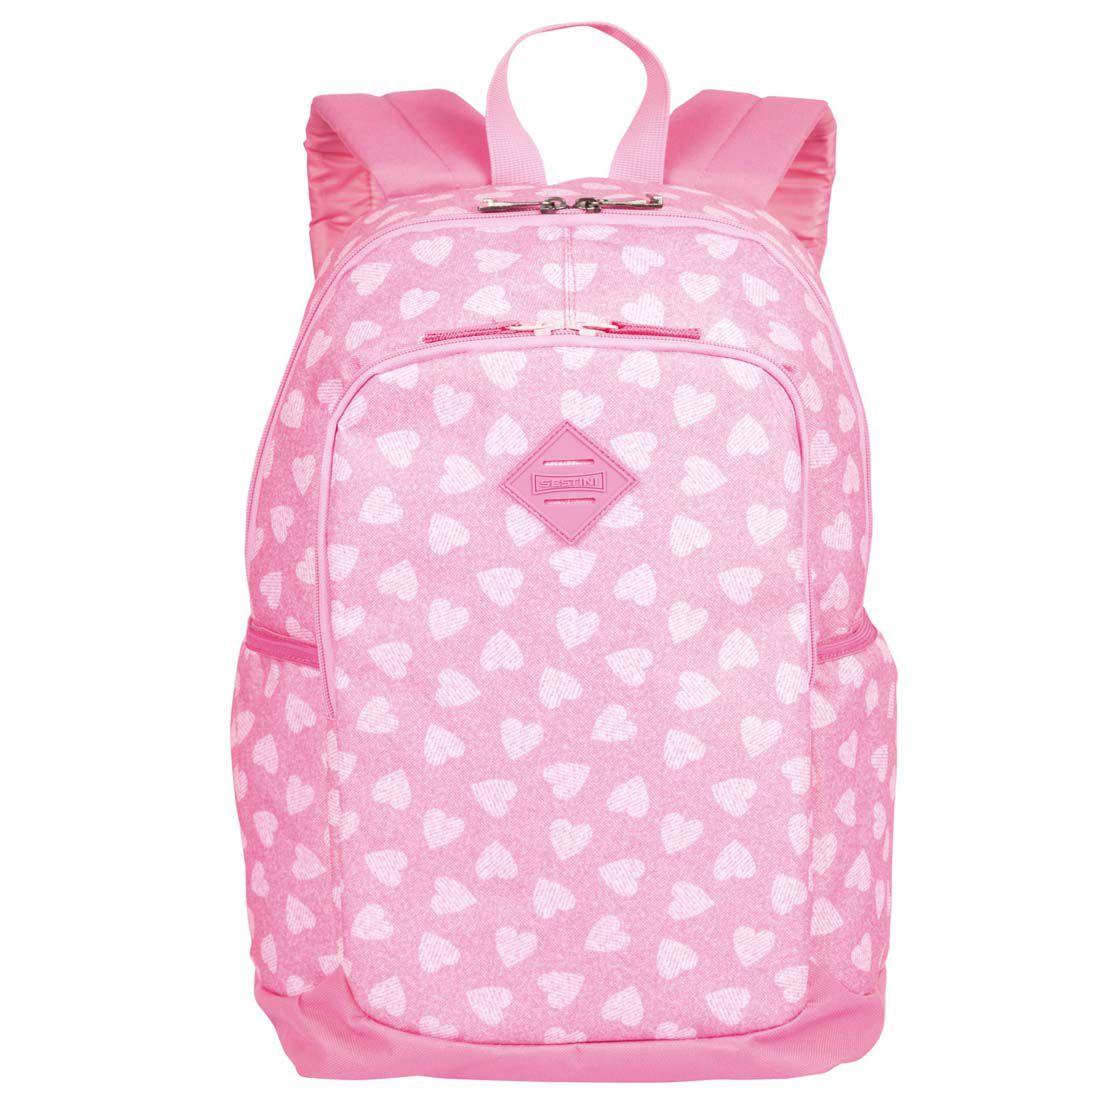 Mochila Escolar Sestini Magic Corações Rosa